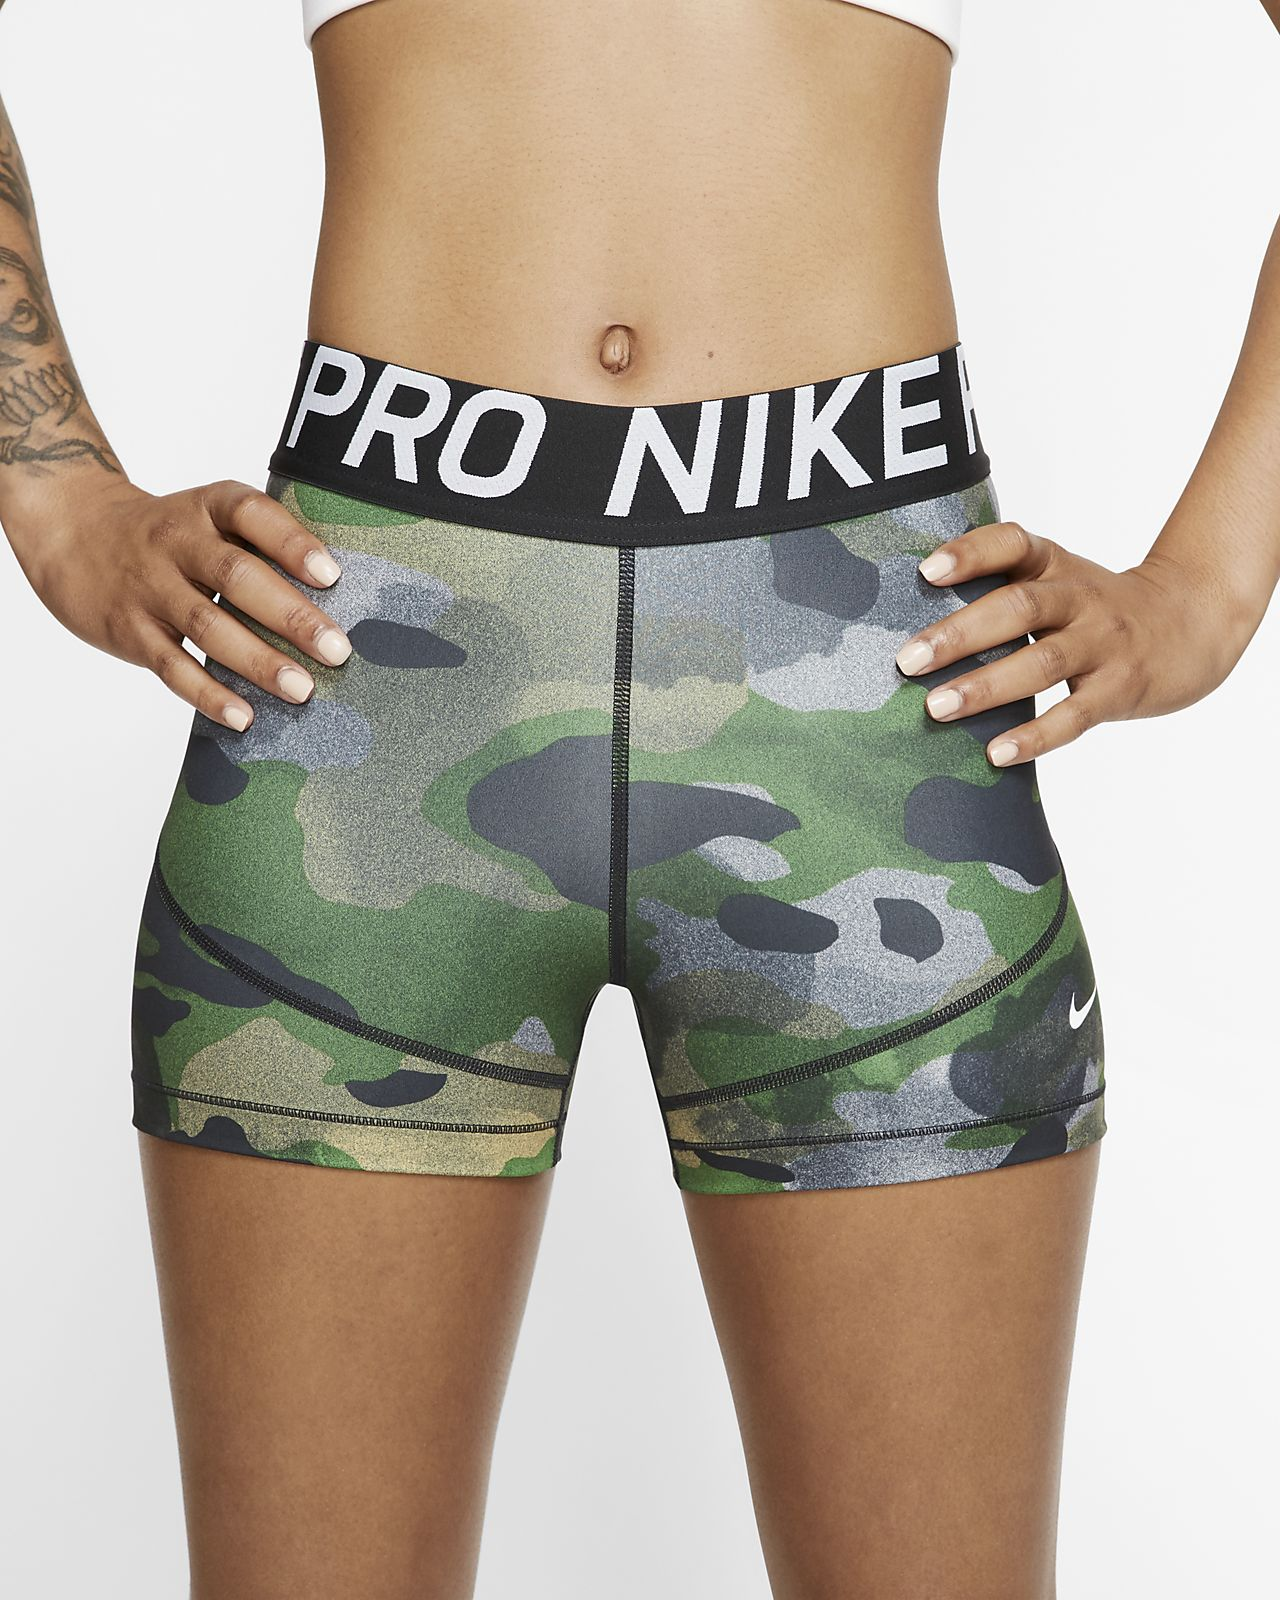 Shorts camuflados de 7,5 cm para mujer Nike Pro